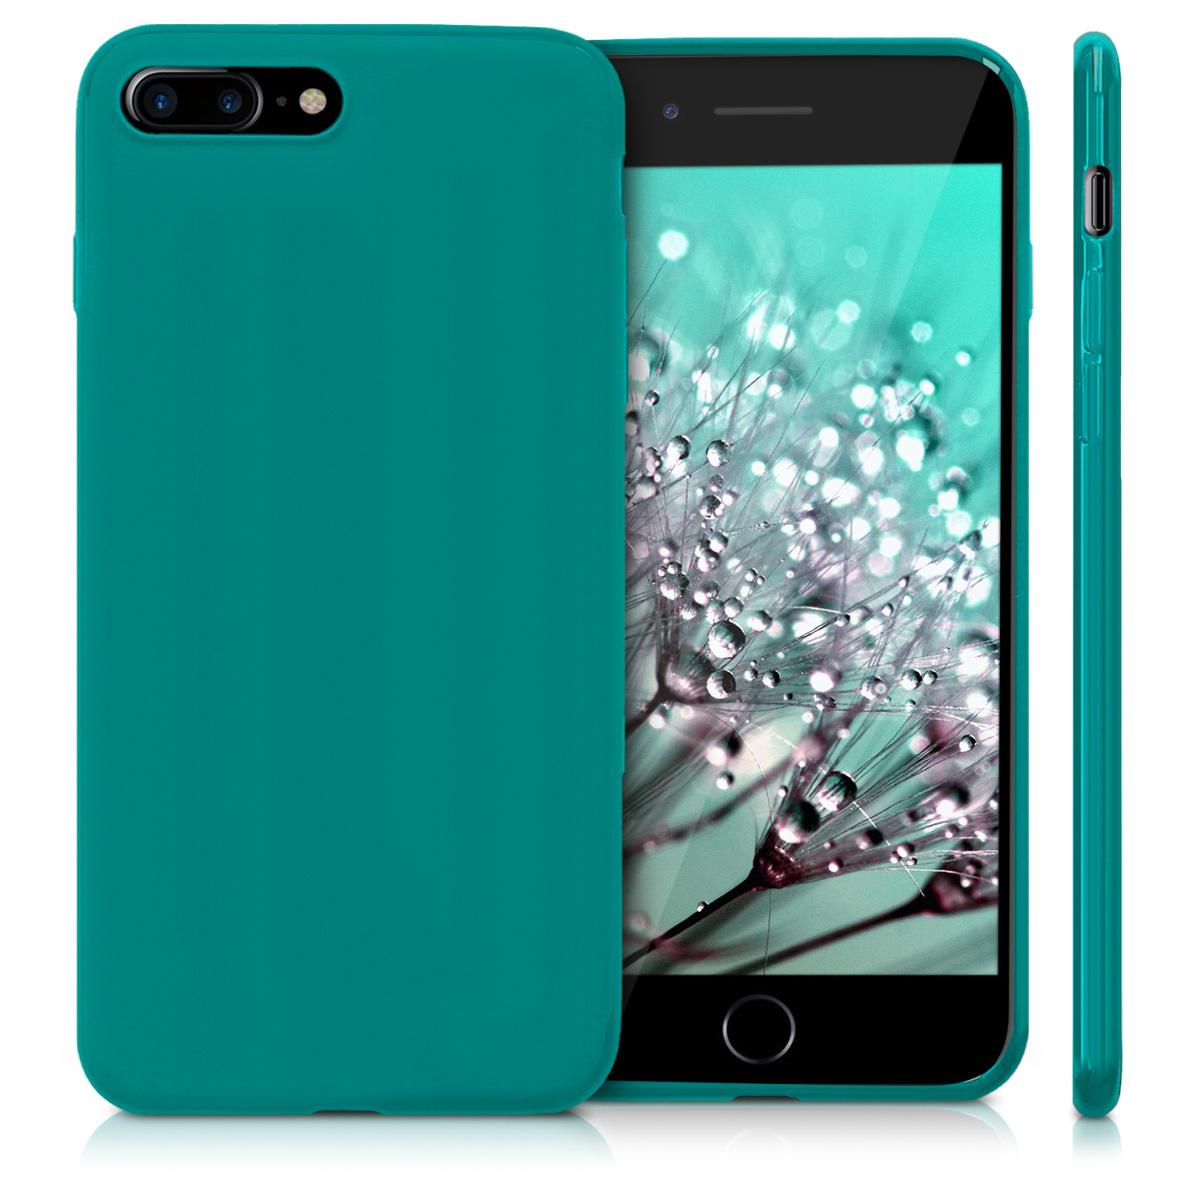 h lle f r apple iphone 7 plus 8 plus handyh lle handy case cover smartphone ebay. Black Bedroom Furniture Sets. Home Design Ideas